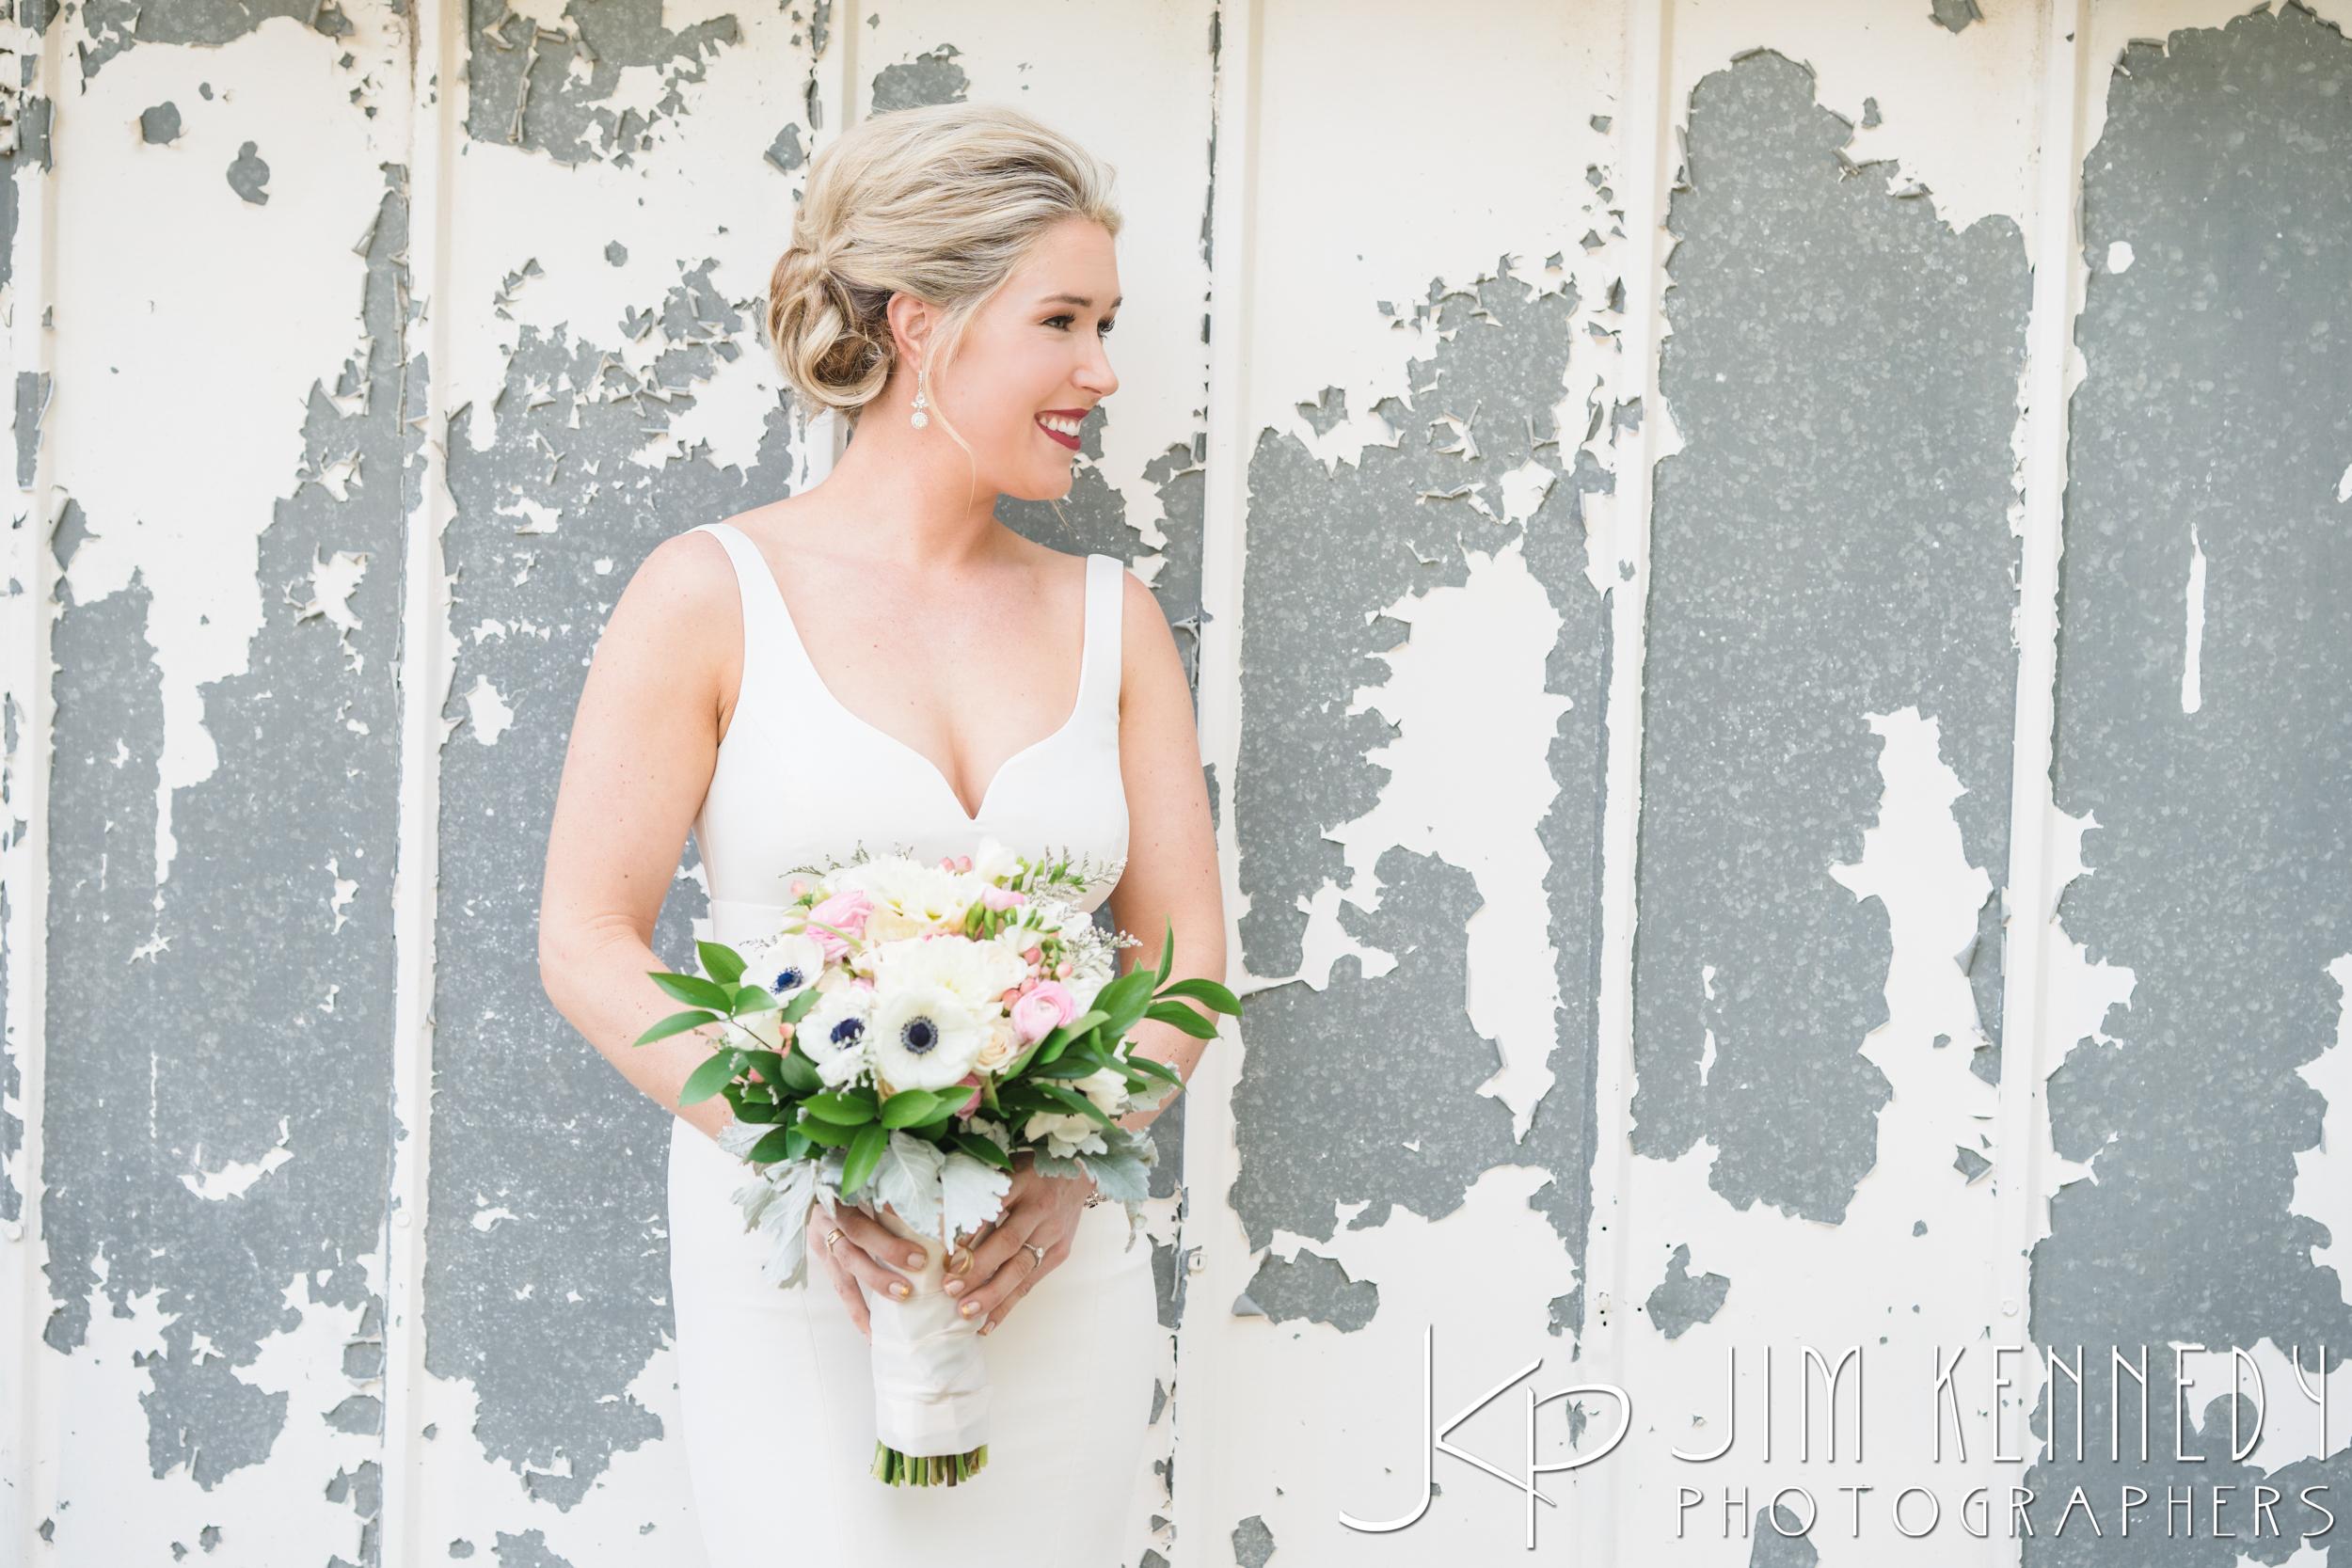 jim_kennedy_photographers_highland_springs_wedding_caitlyn_0077.jpg